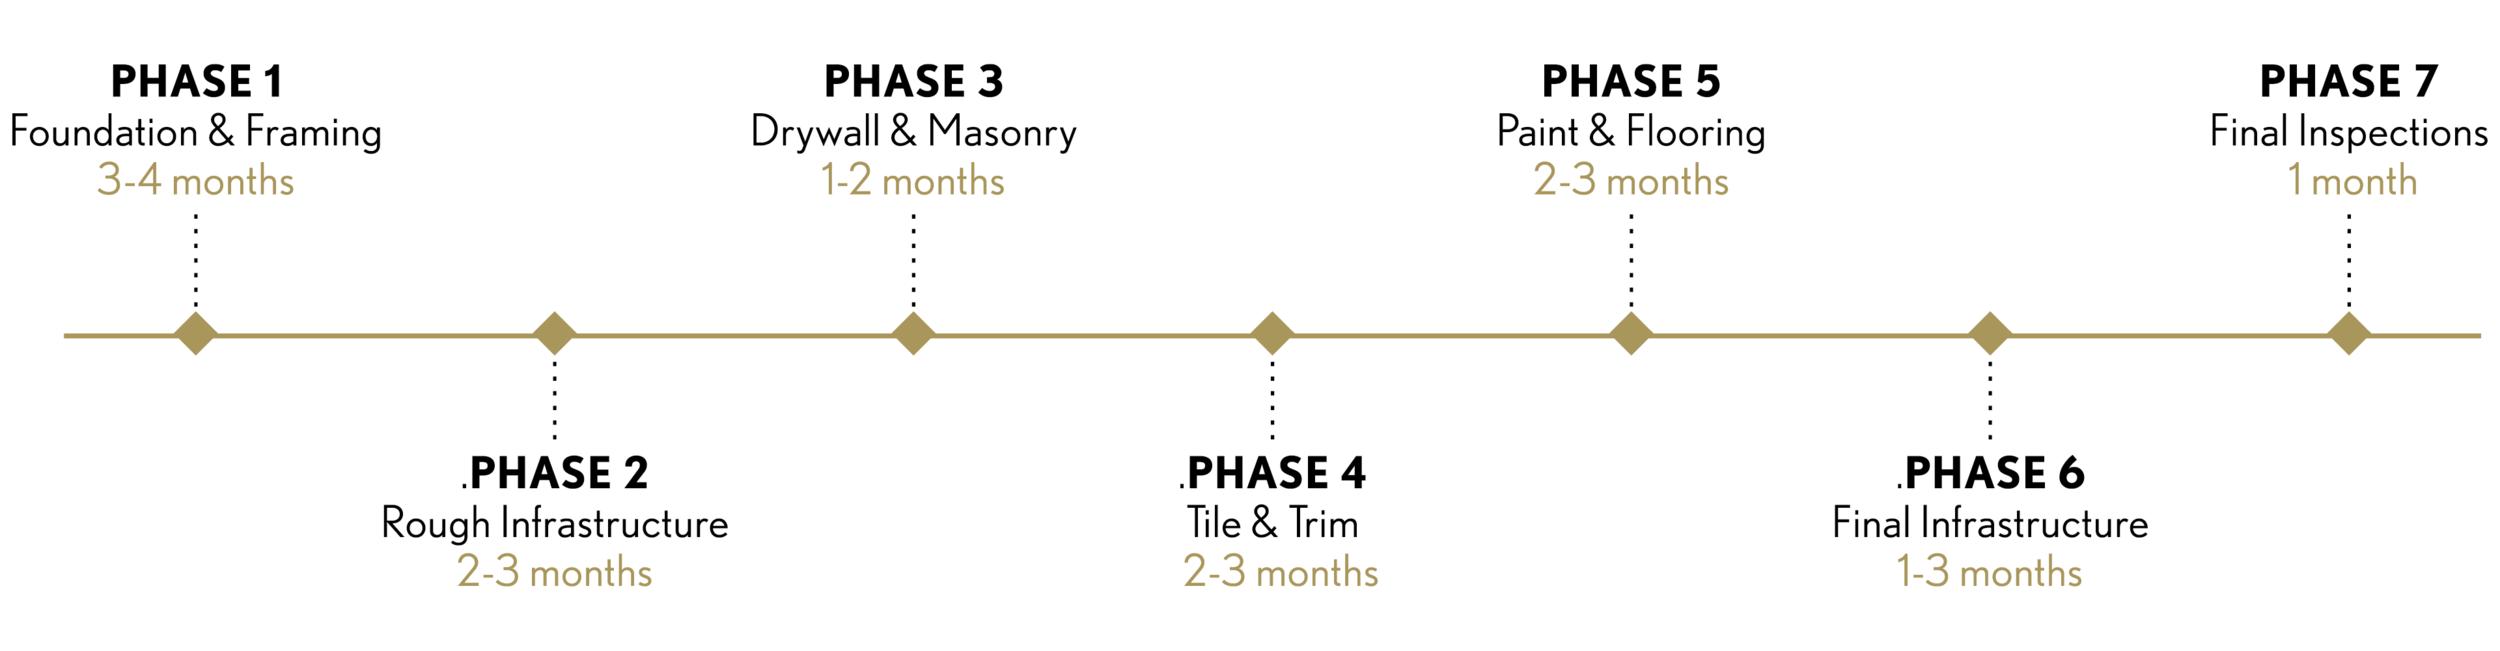 sapphire-construction-timeline.png